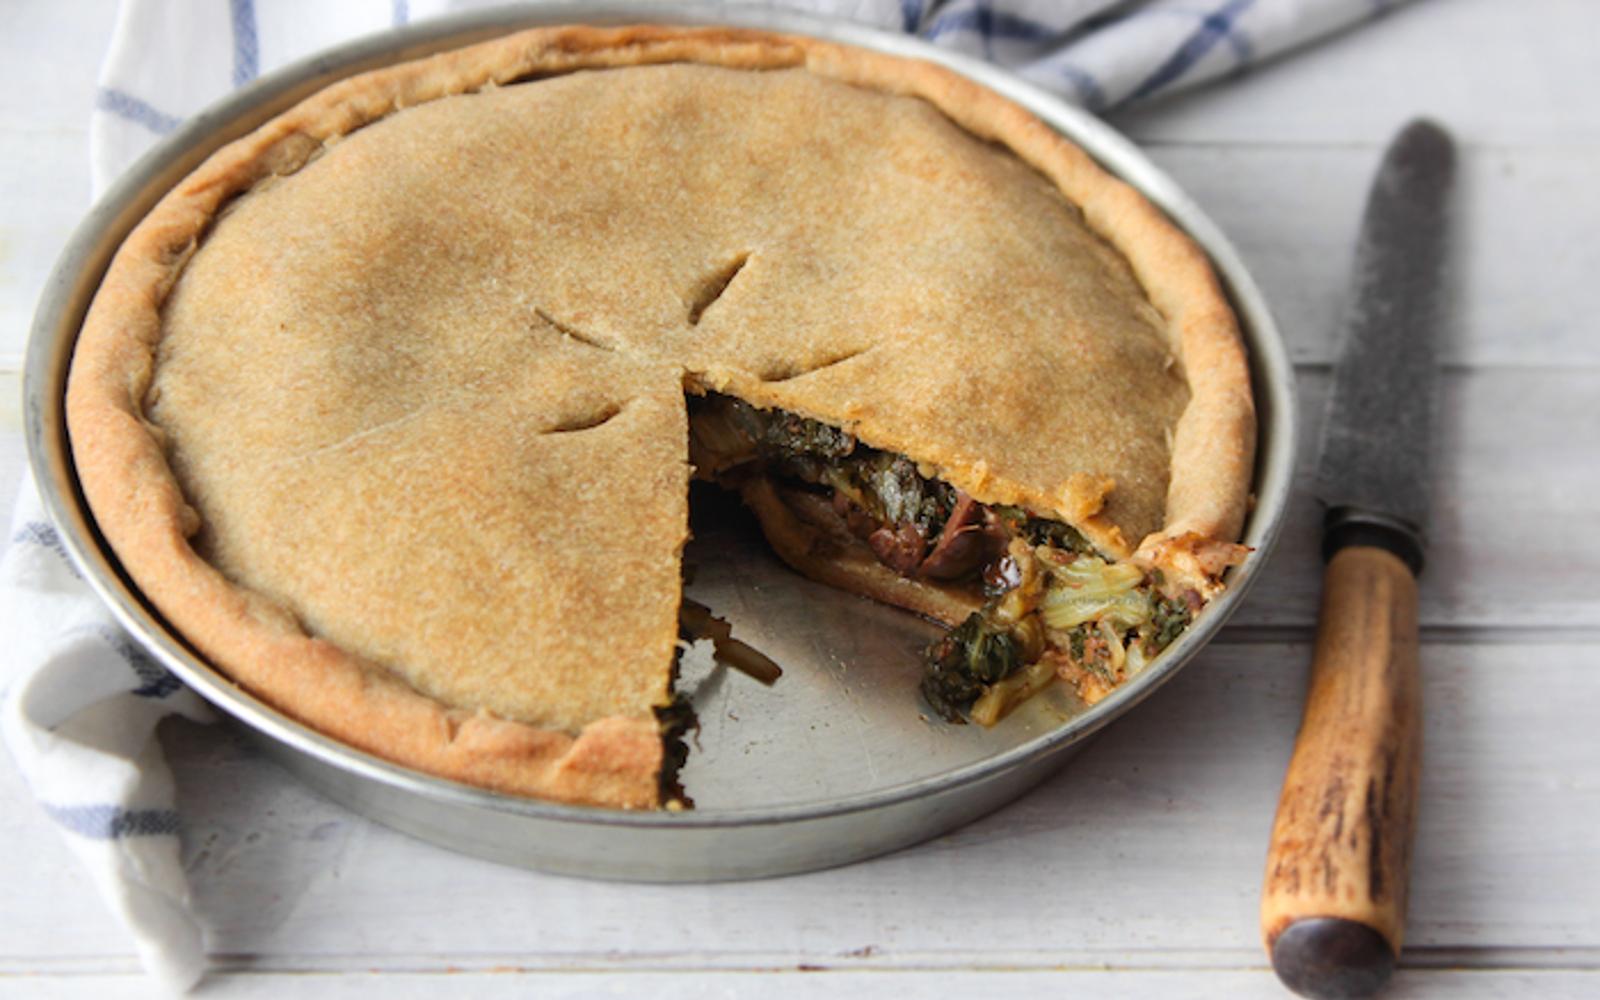 Vegan Beet and Olive Pie With Quinoa Flour Crust